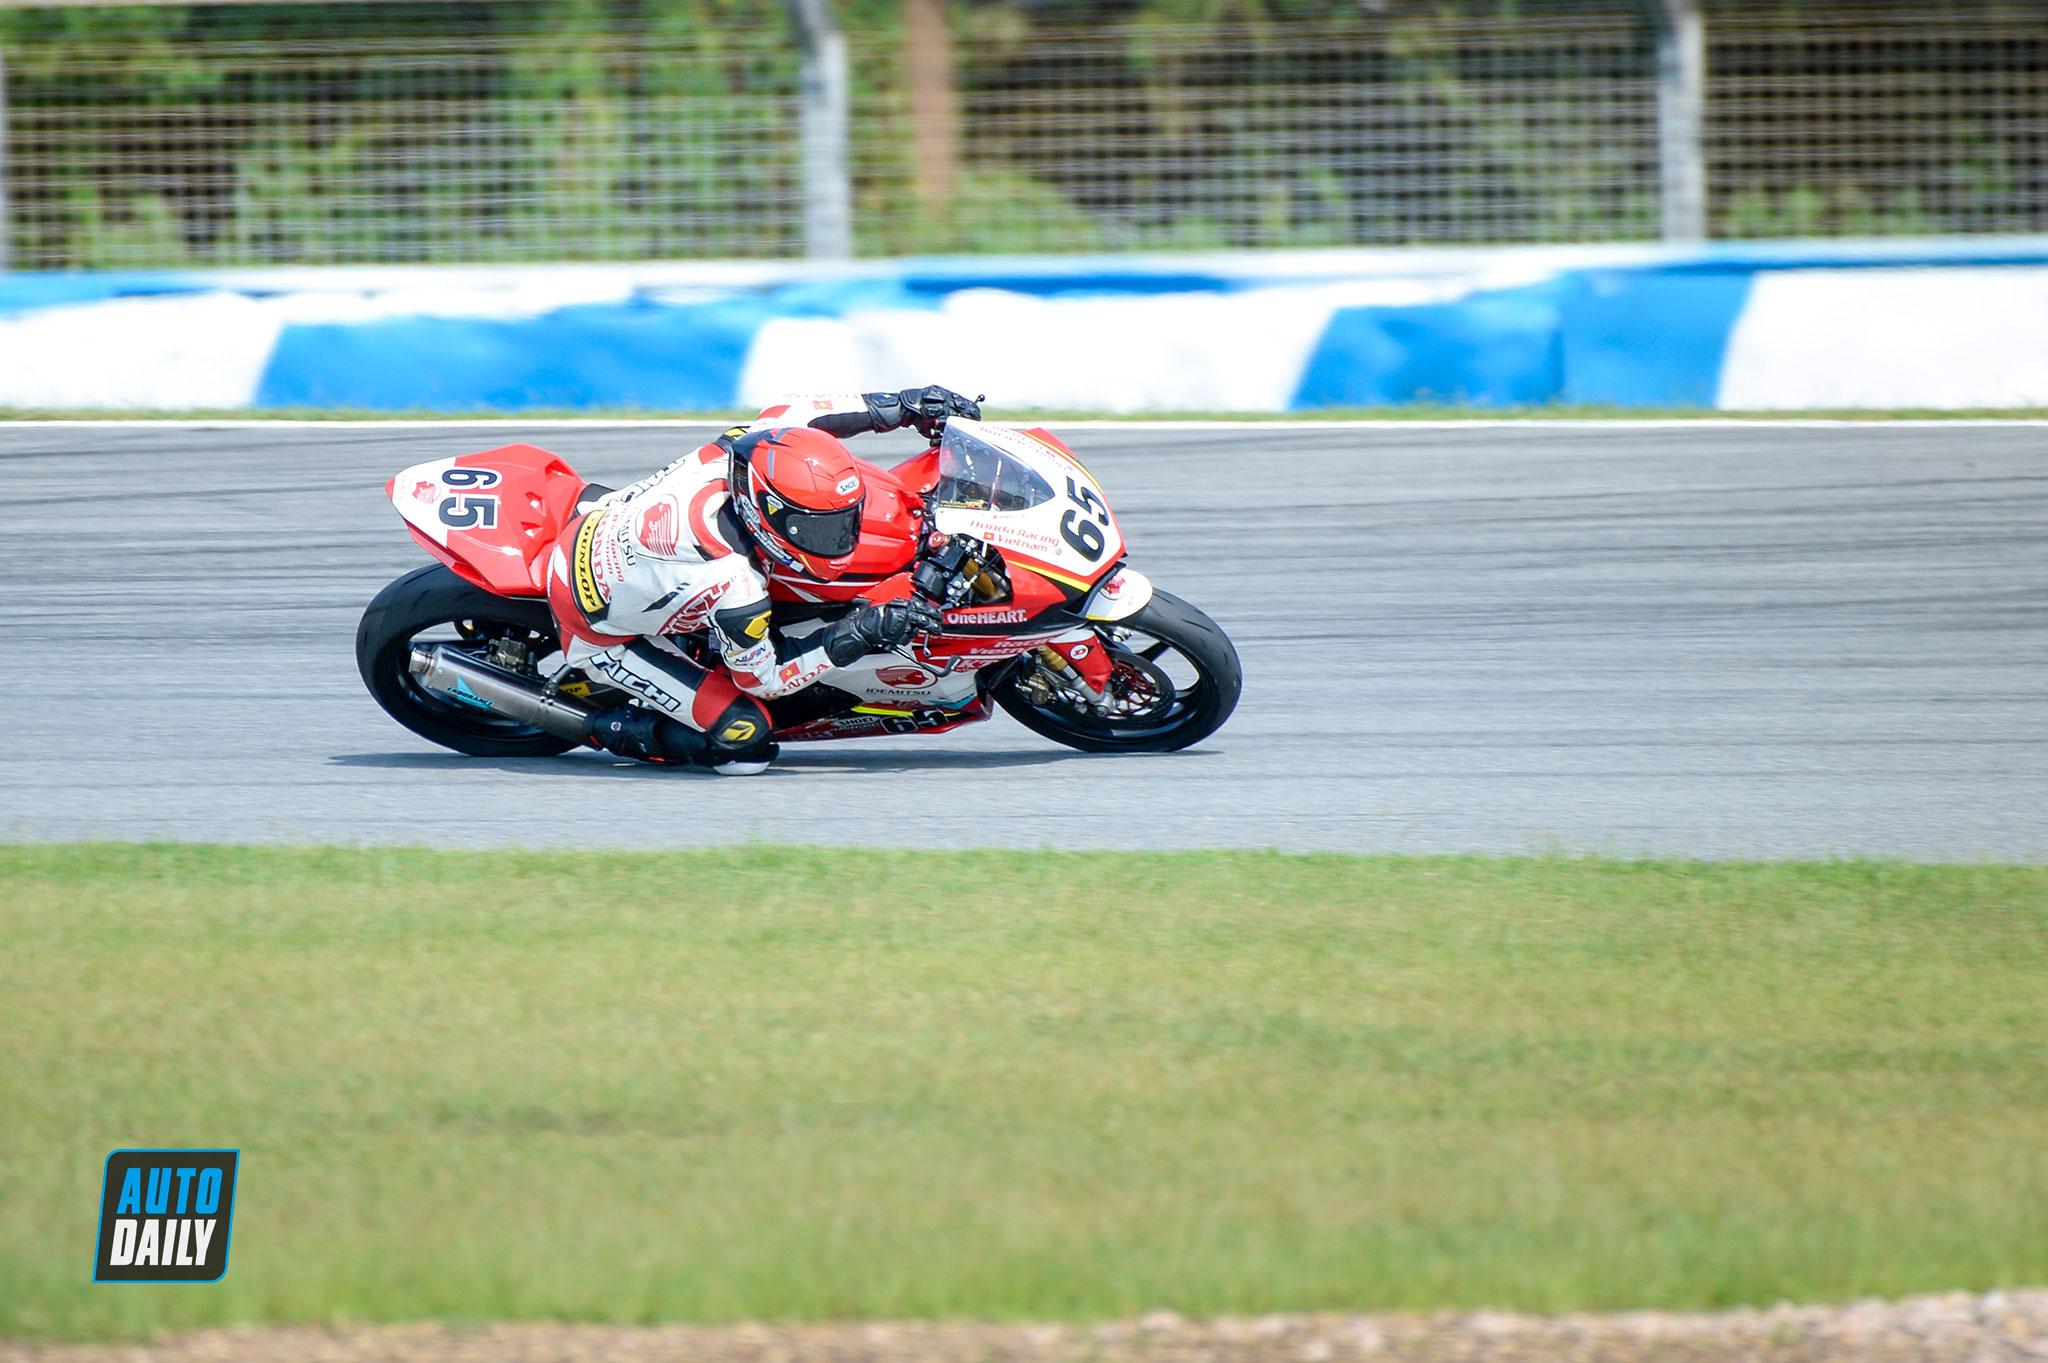 arrc-round5-race1-autodaily-07.jpg